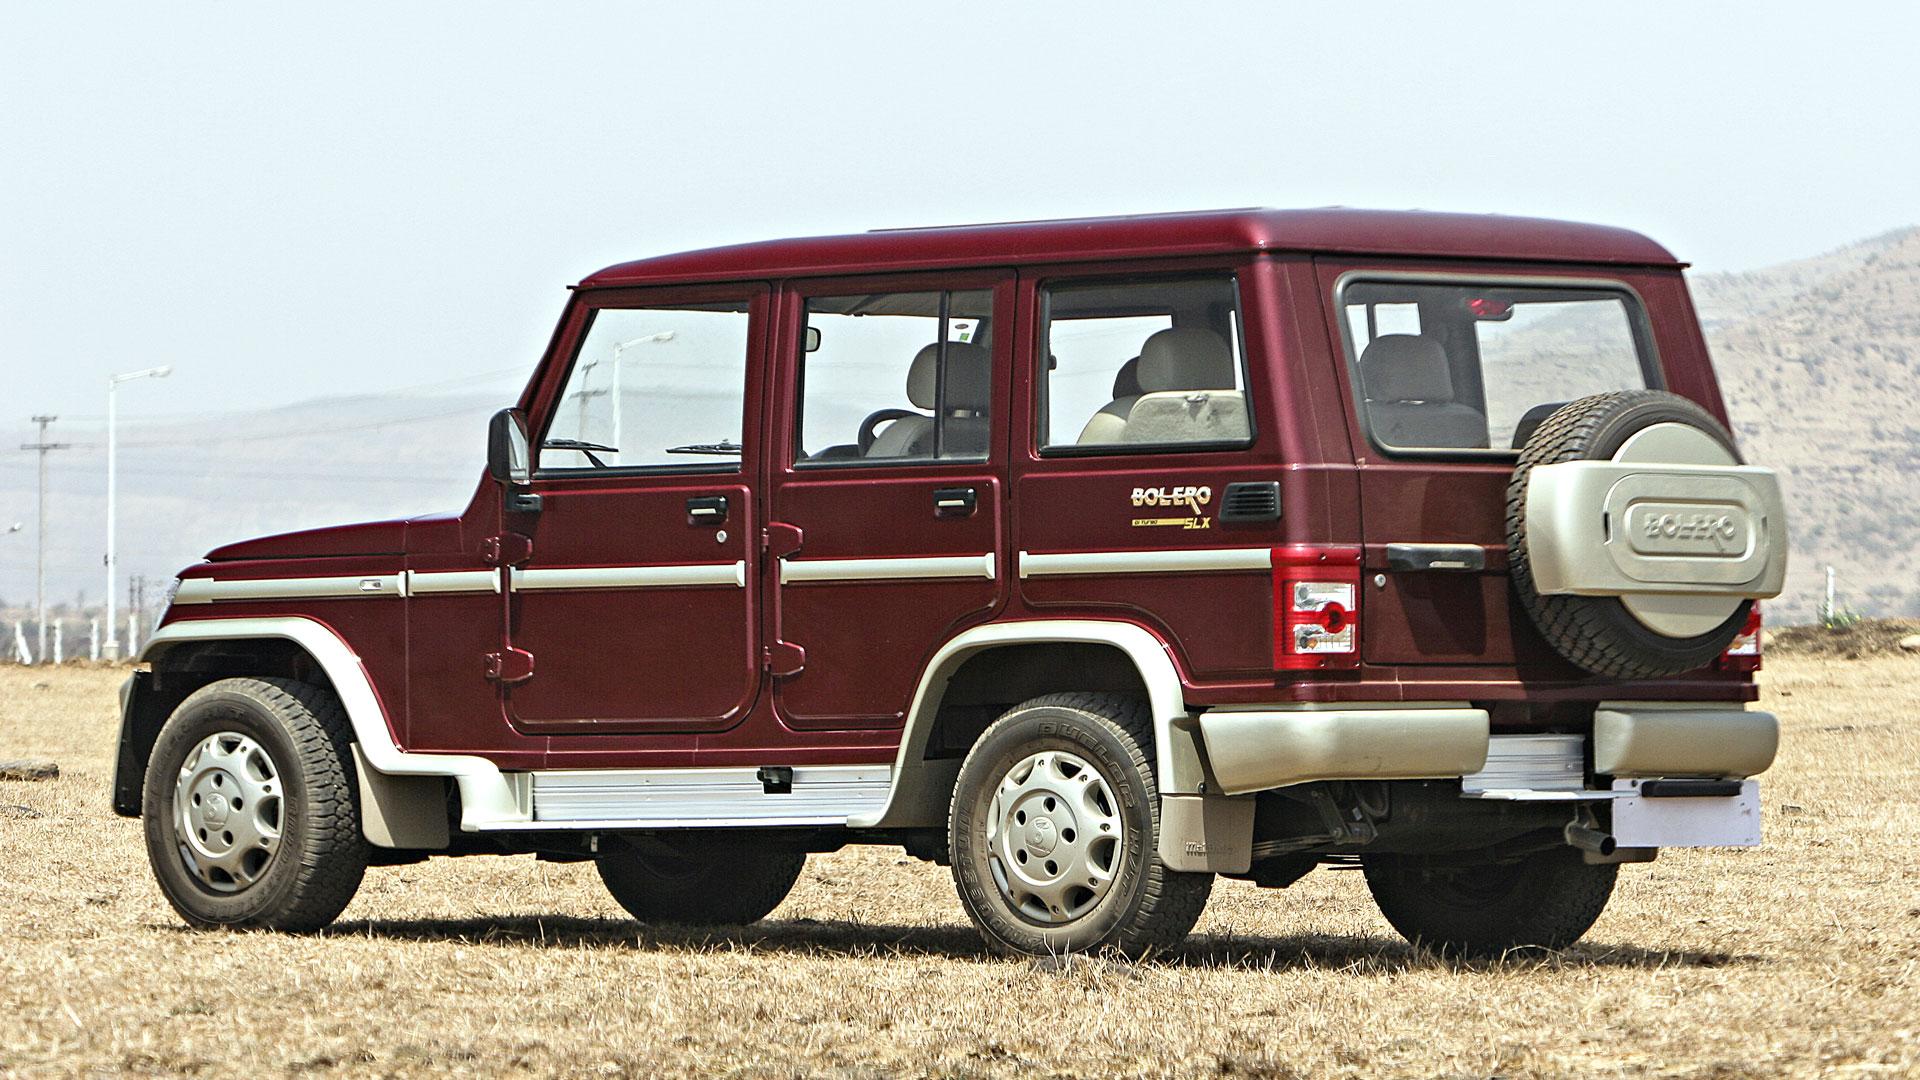 Mahindra-Bolero-2013 Compare Car Photos - Overdrive